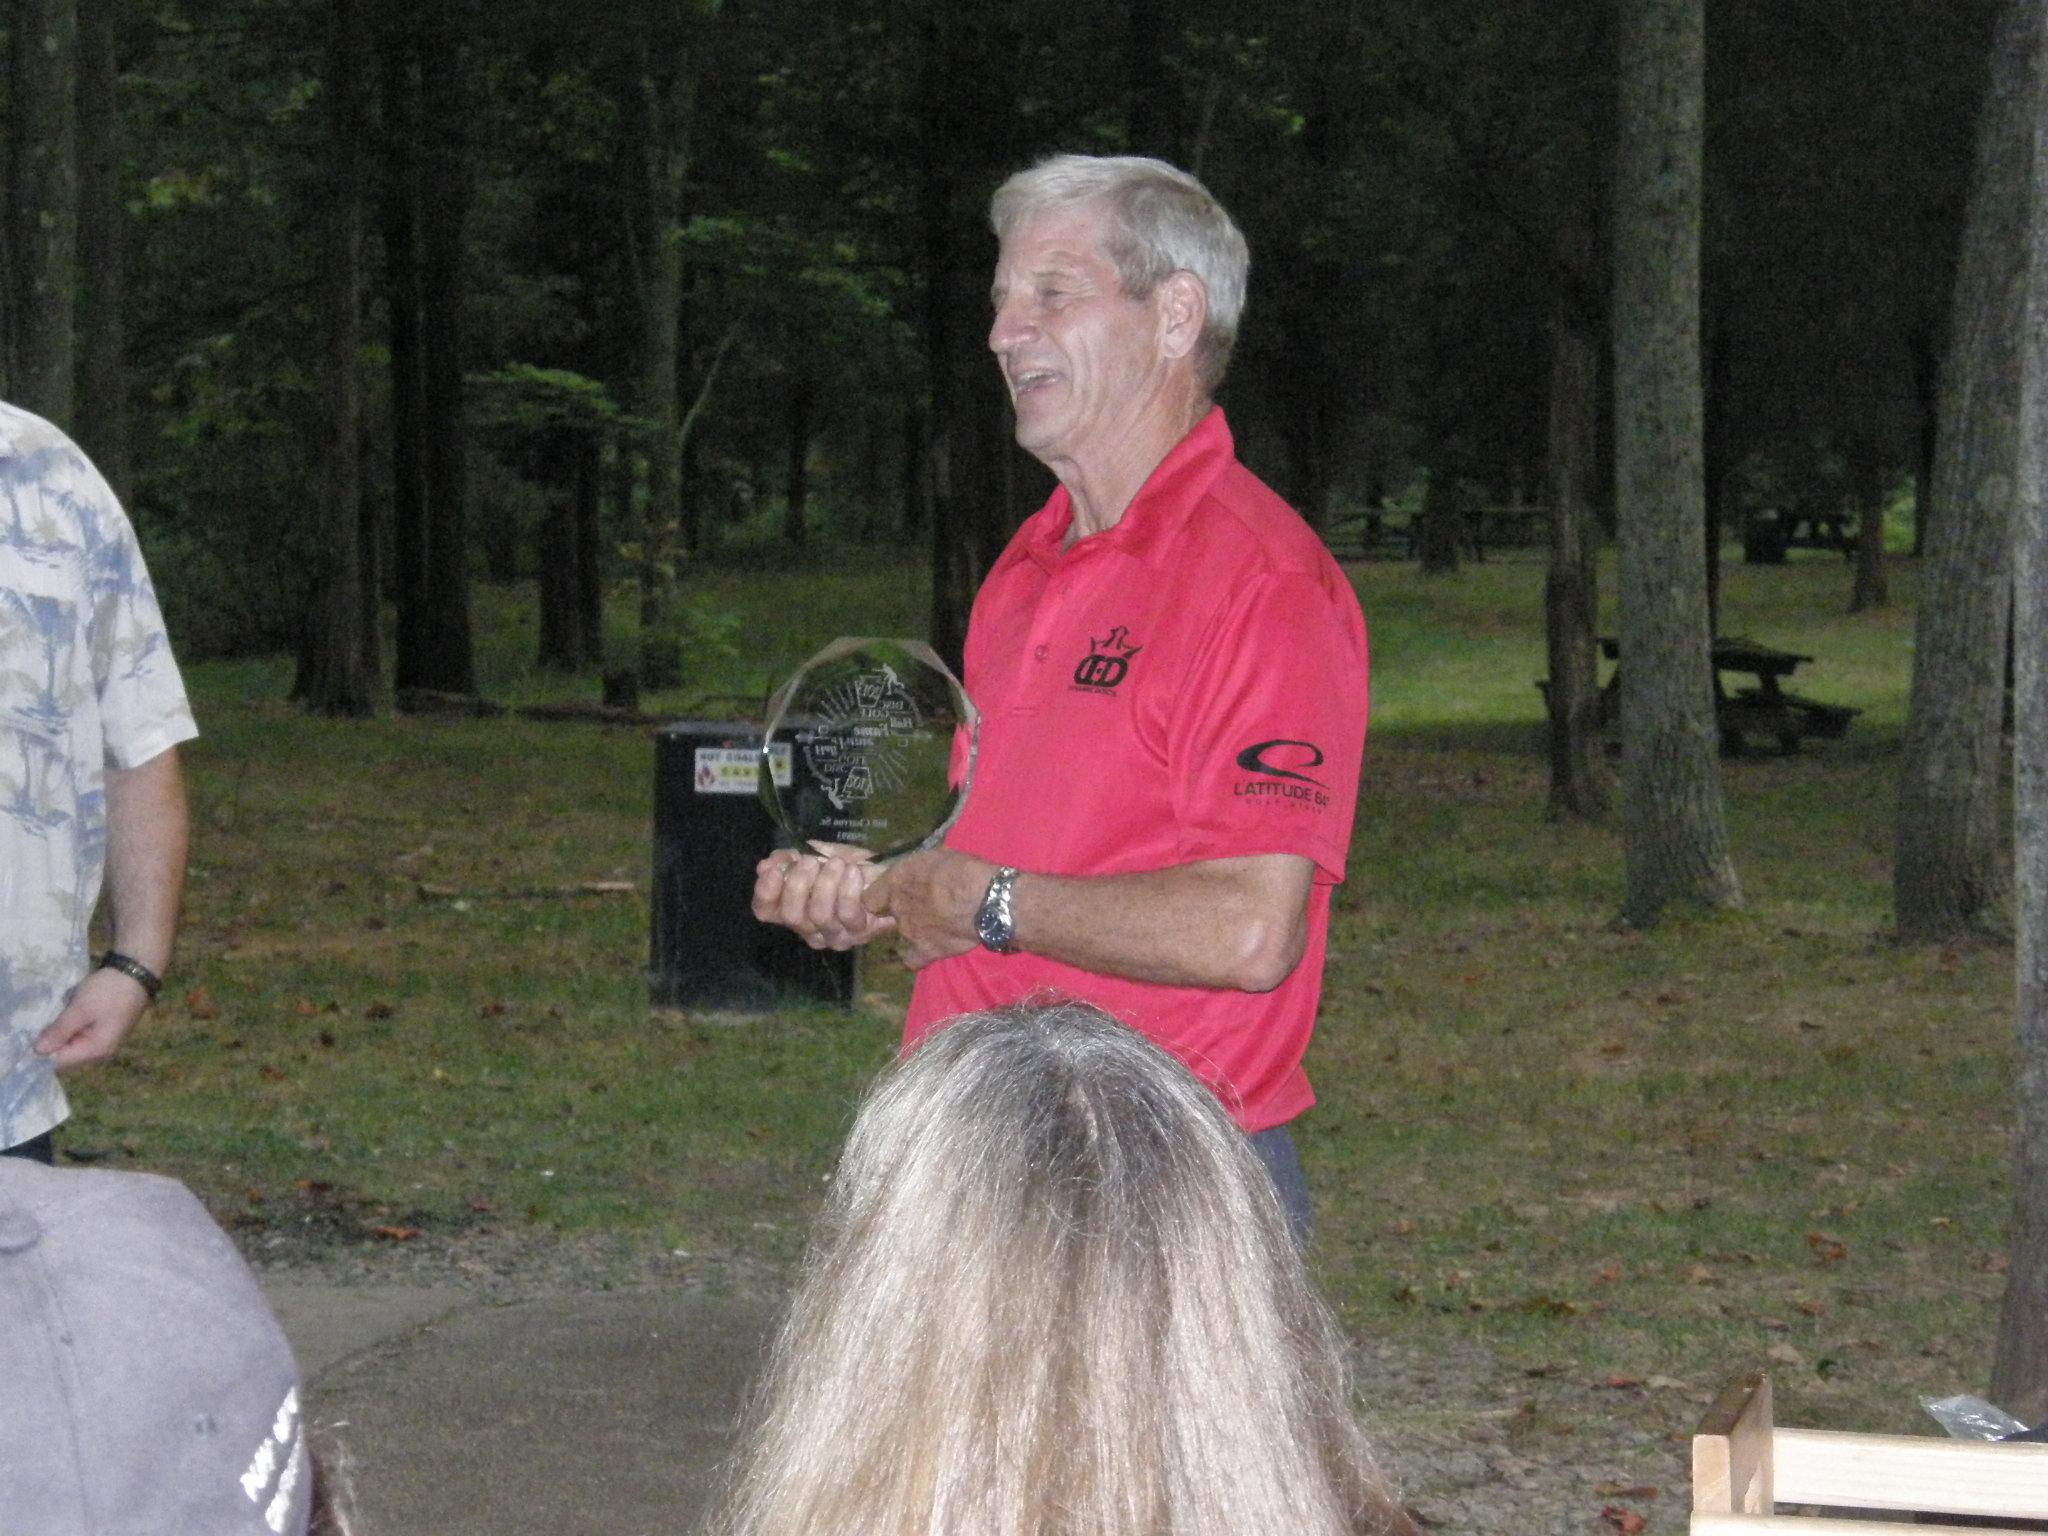 Bill Charron Sr receiving his award